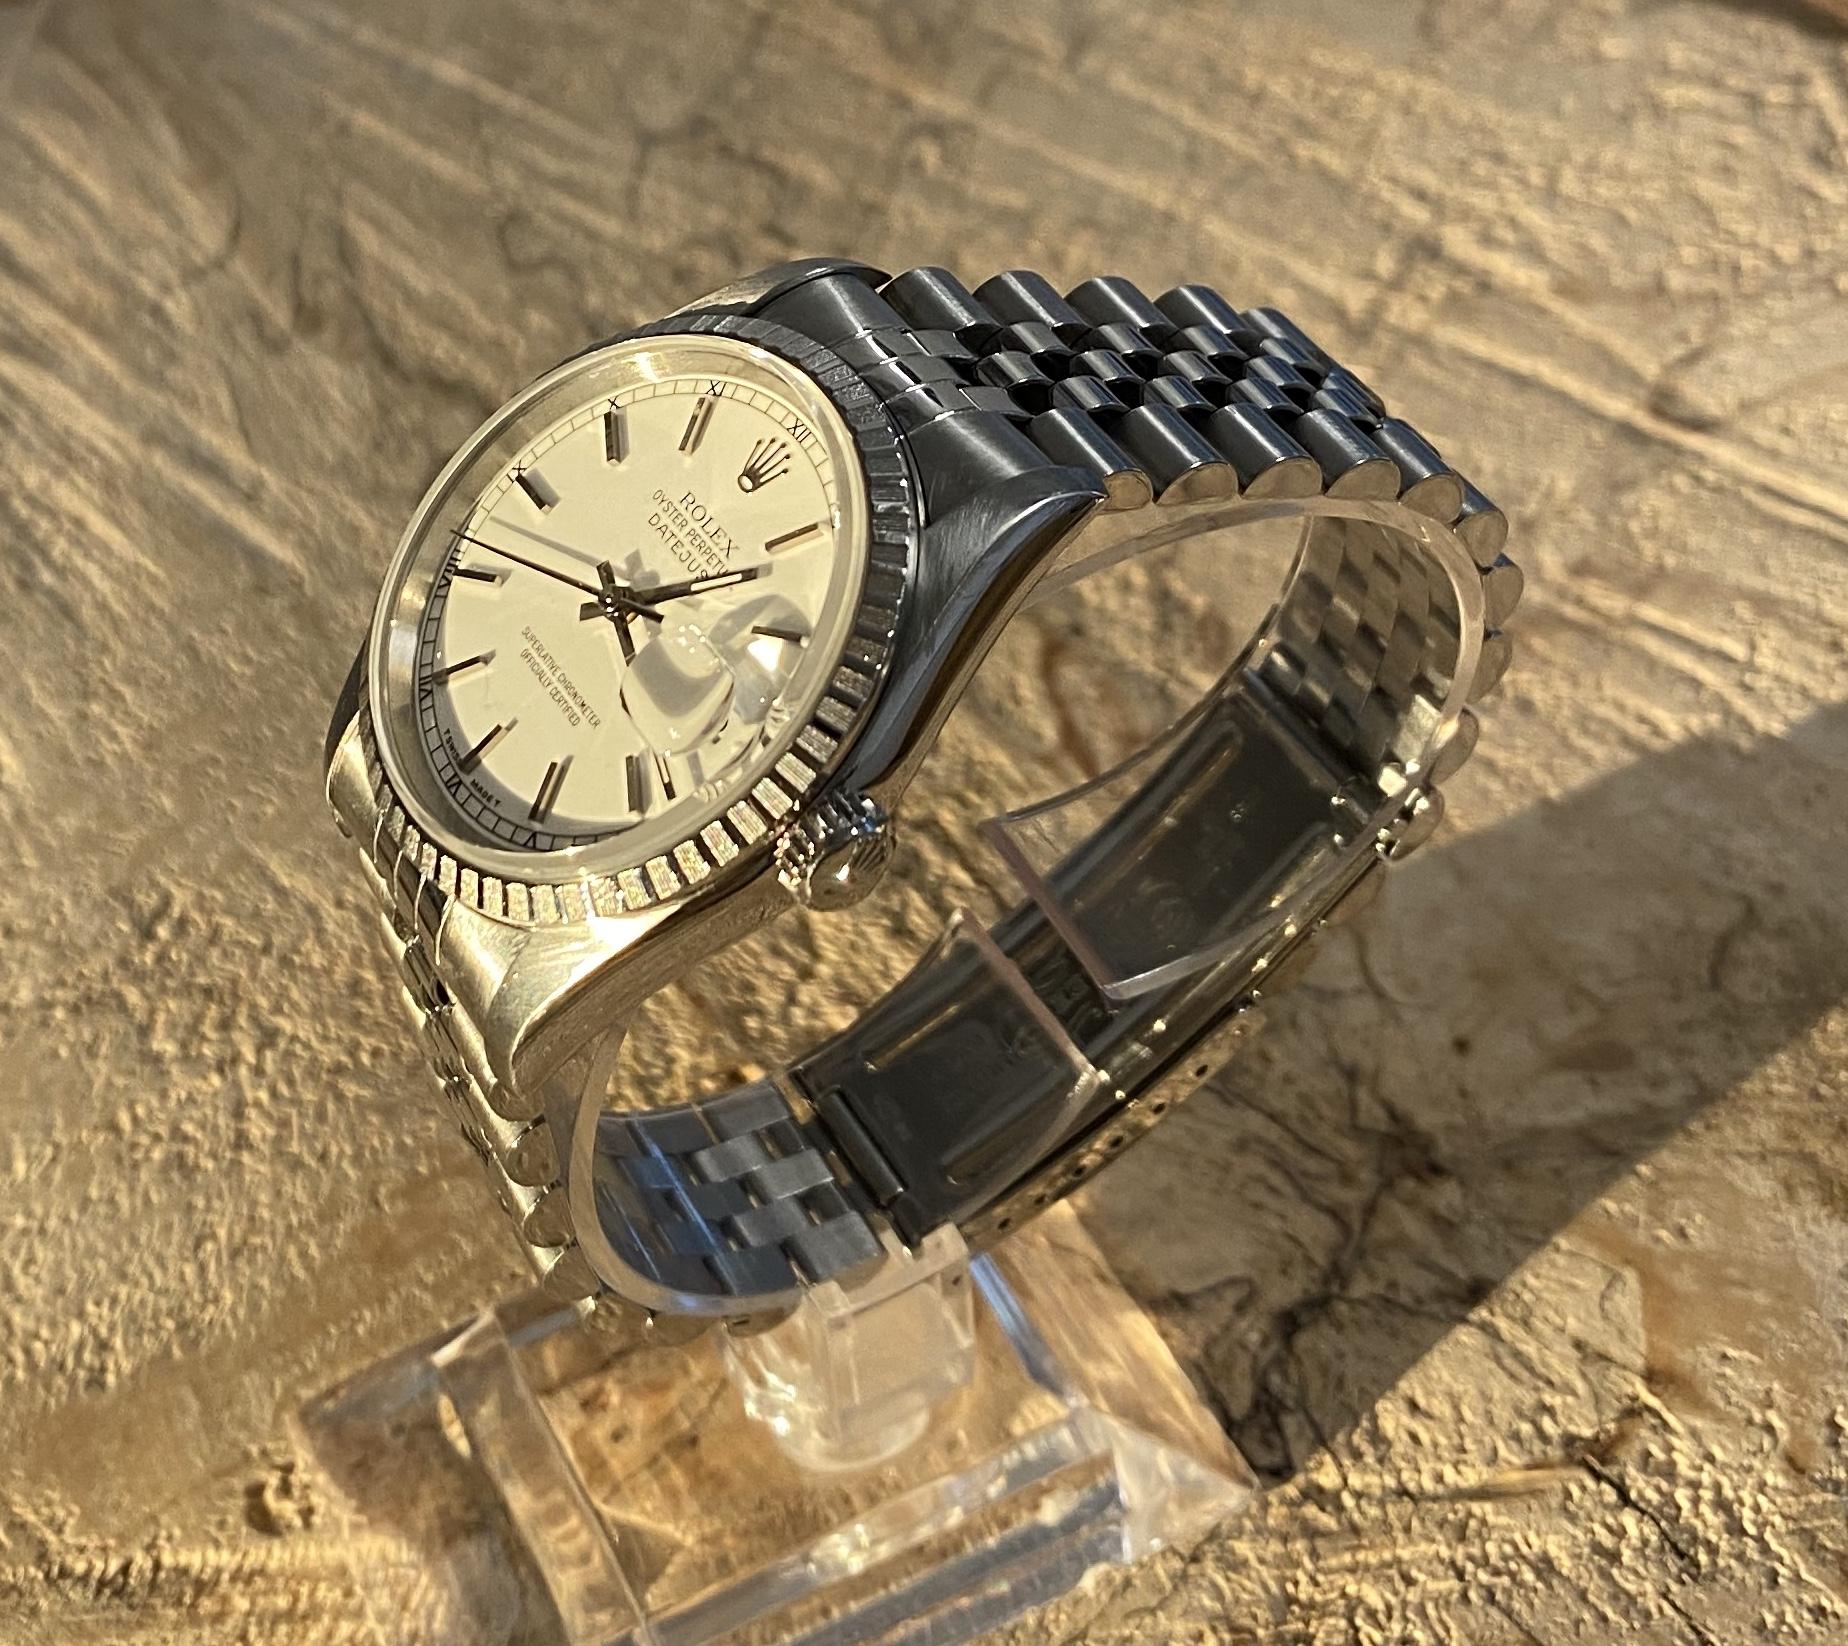 Lot 56 - Gents Rolex Datejust 16220 S/Steel 36mm * 2 YEARS GUARANTEE*